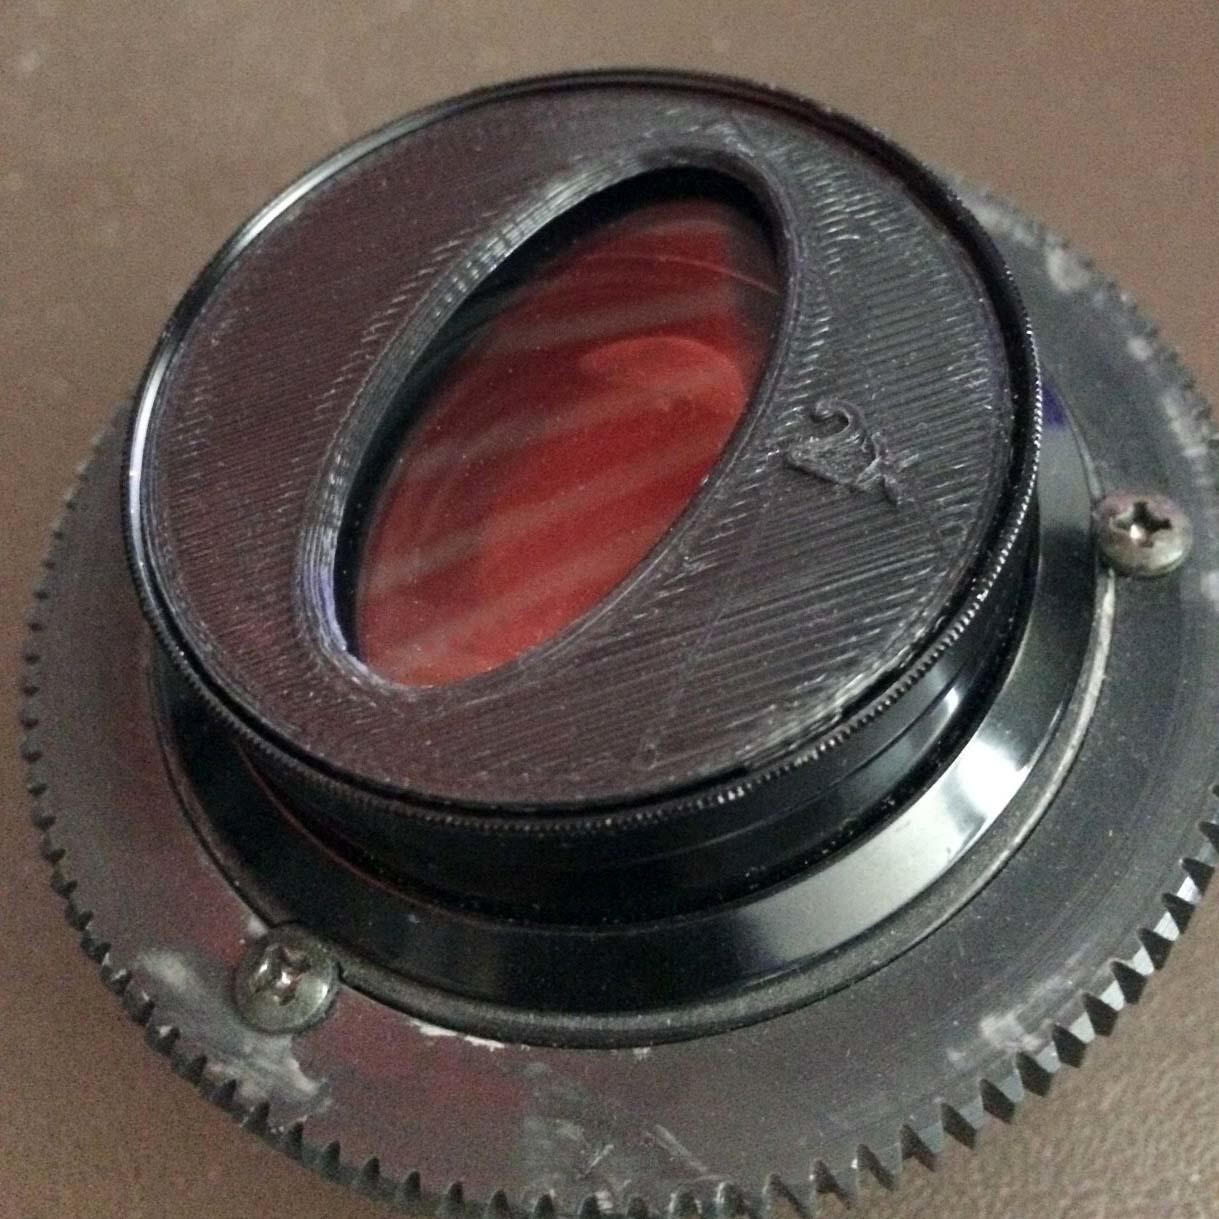 2x.jpg Download STL file Photo bokeh set 52mm • 3D printing template, vintage-lens